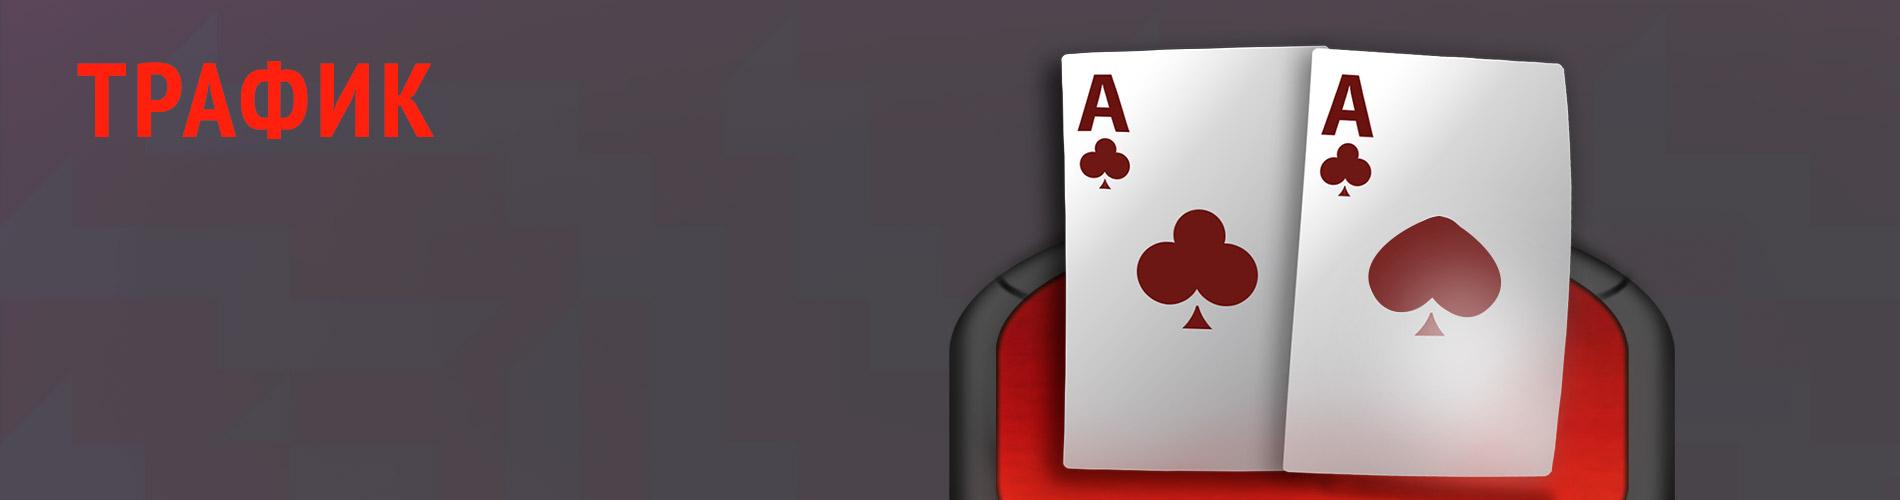 Трафик в покерном руме GGPokerok.